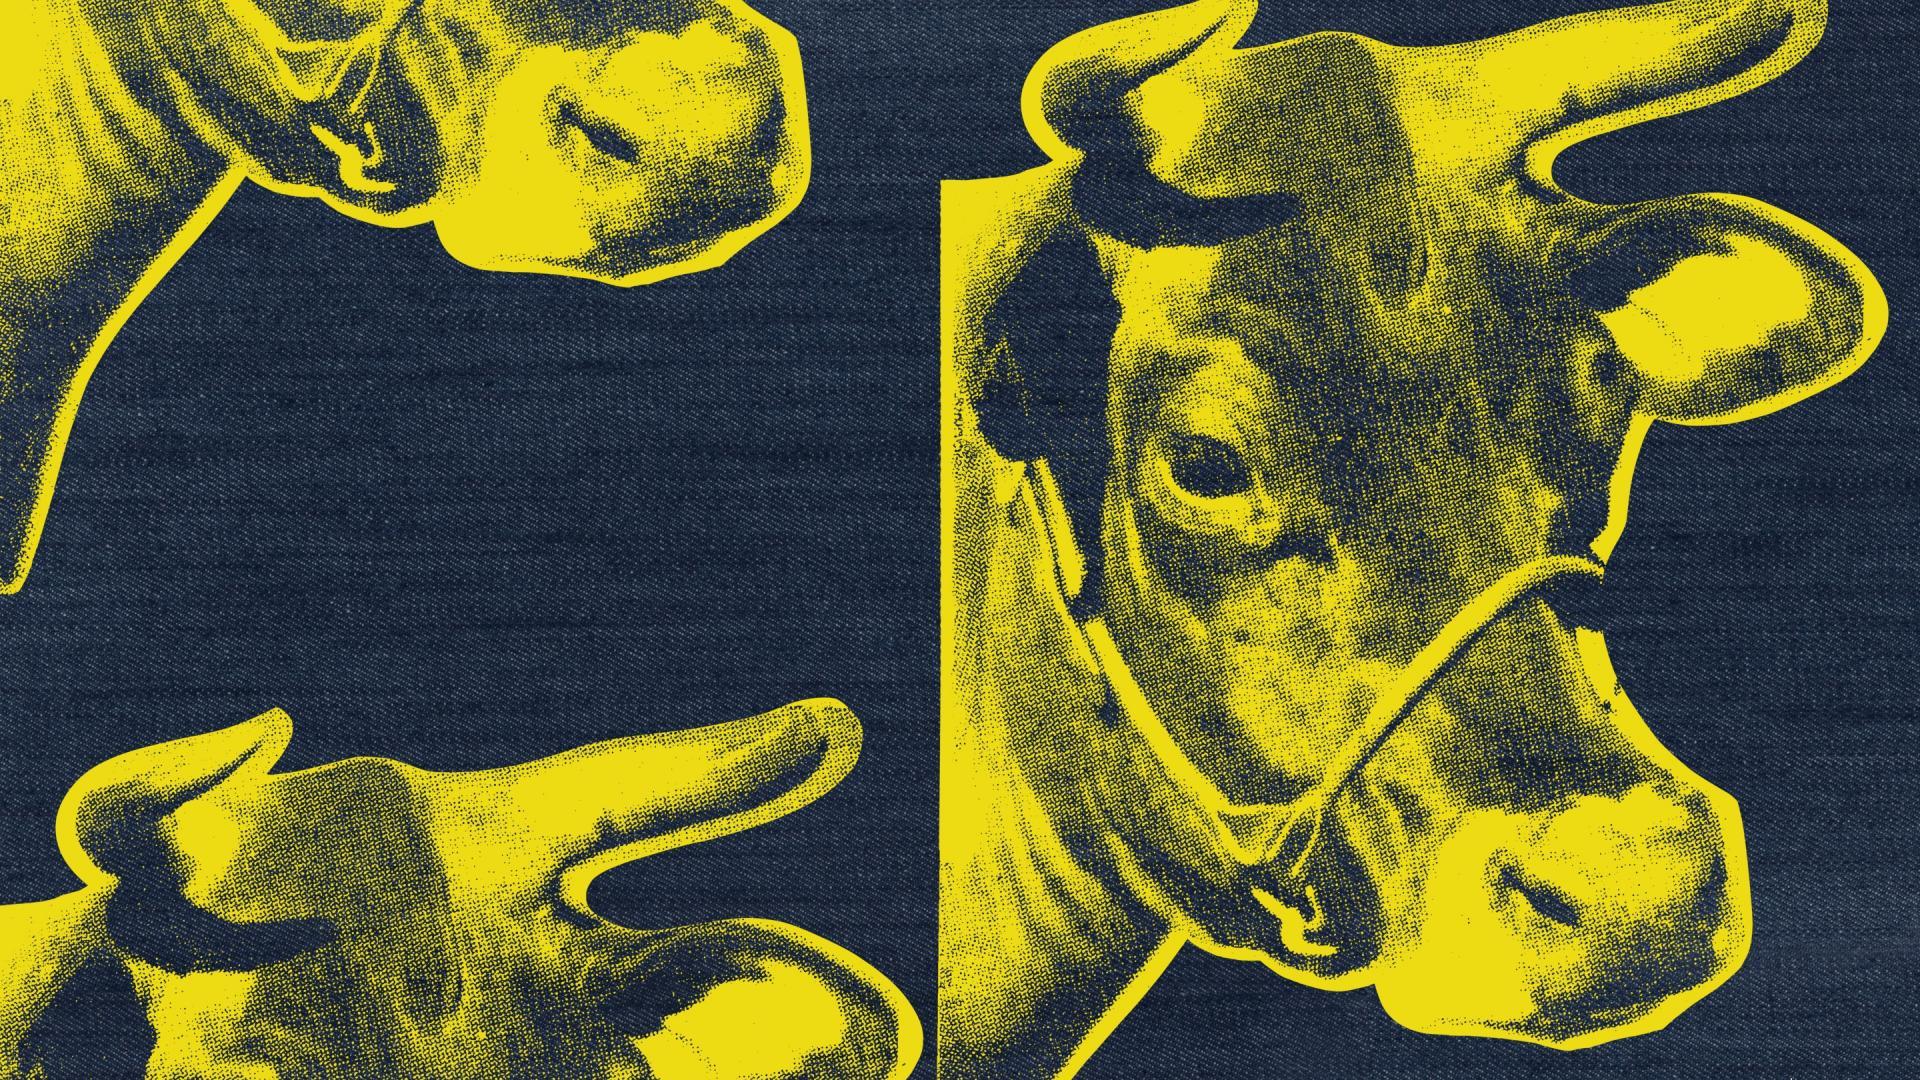 Cows andy warhol incase retina wallpaper 16020 1920x1080